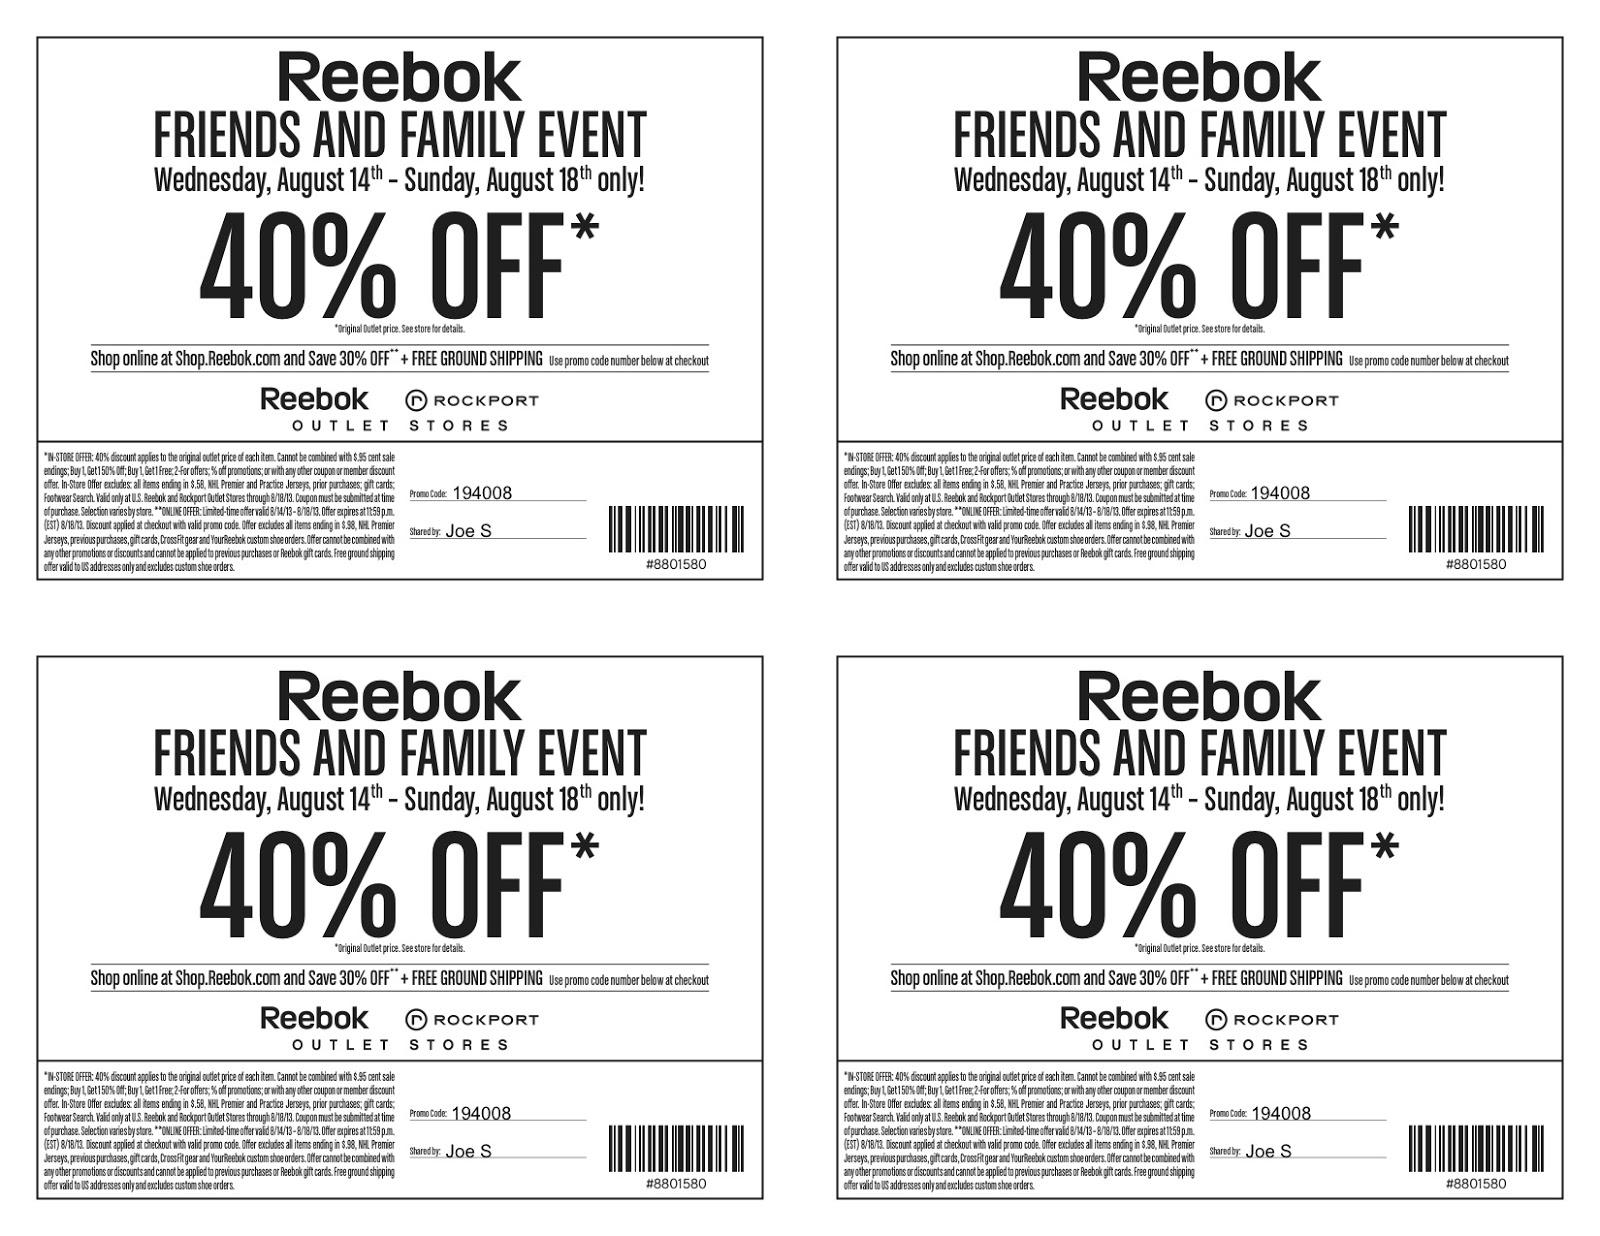 Reebok coupon codes